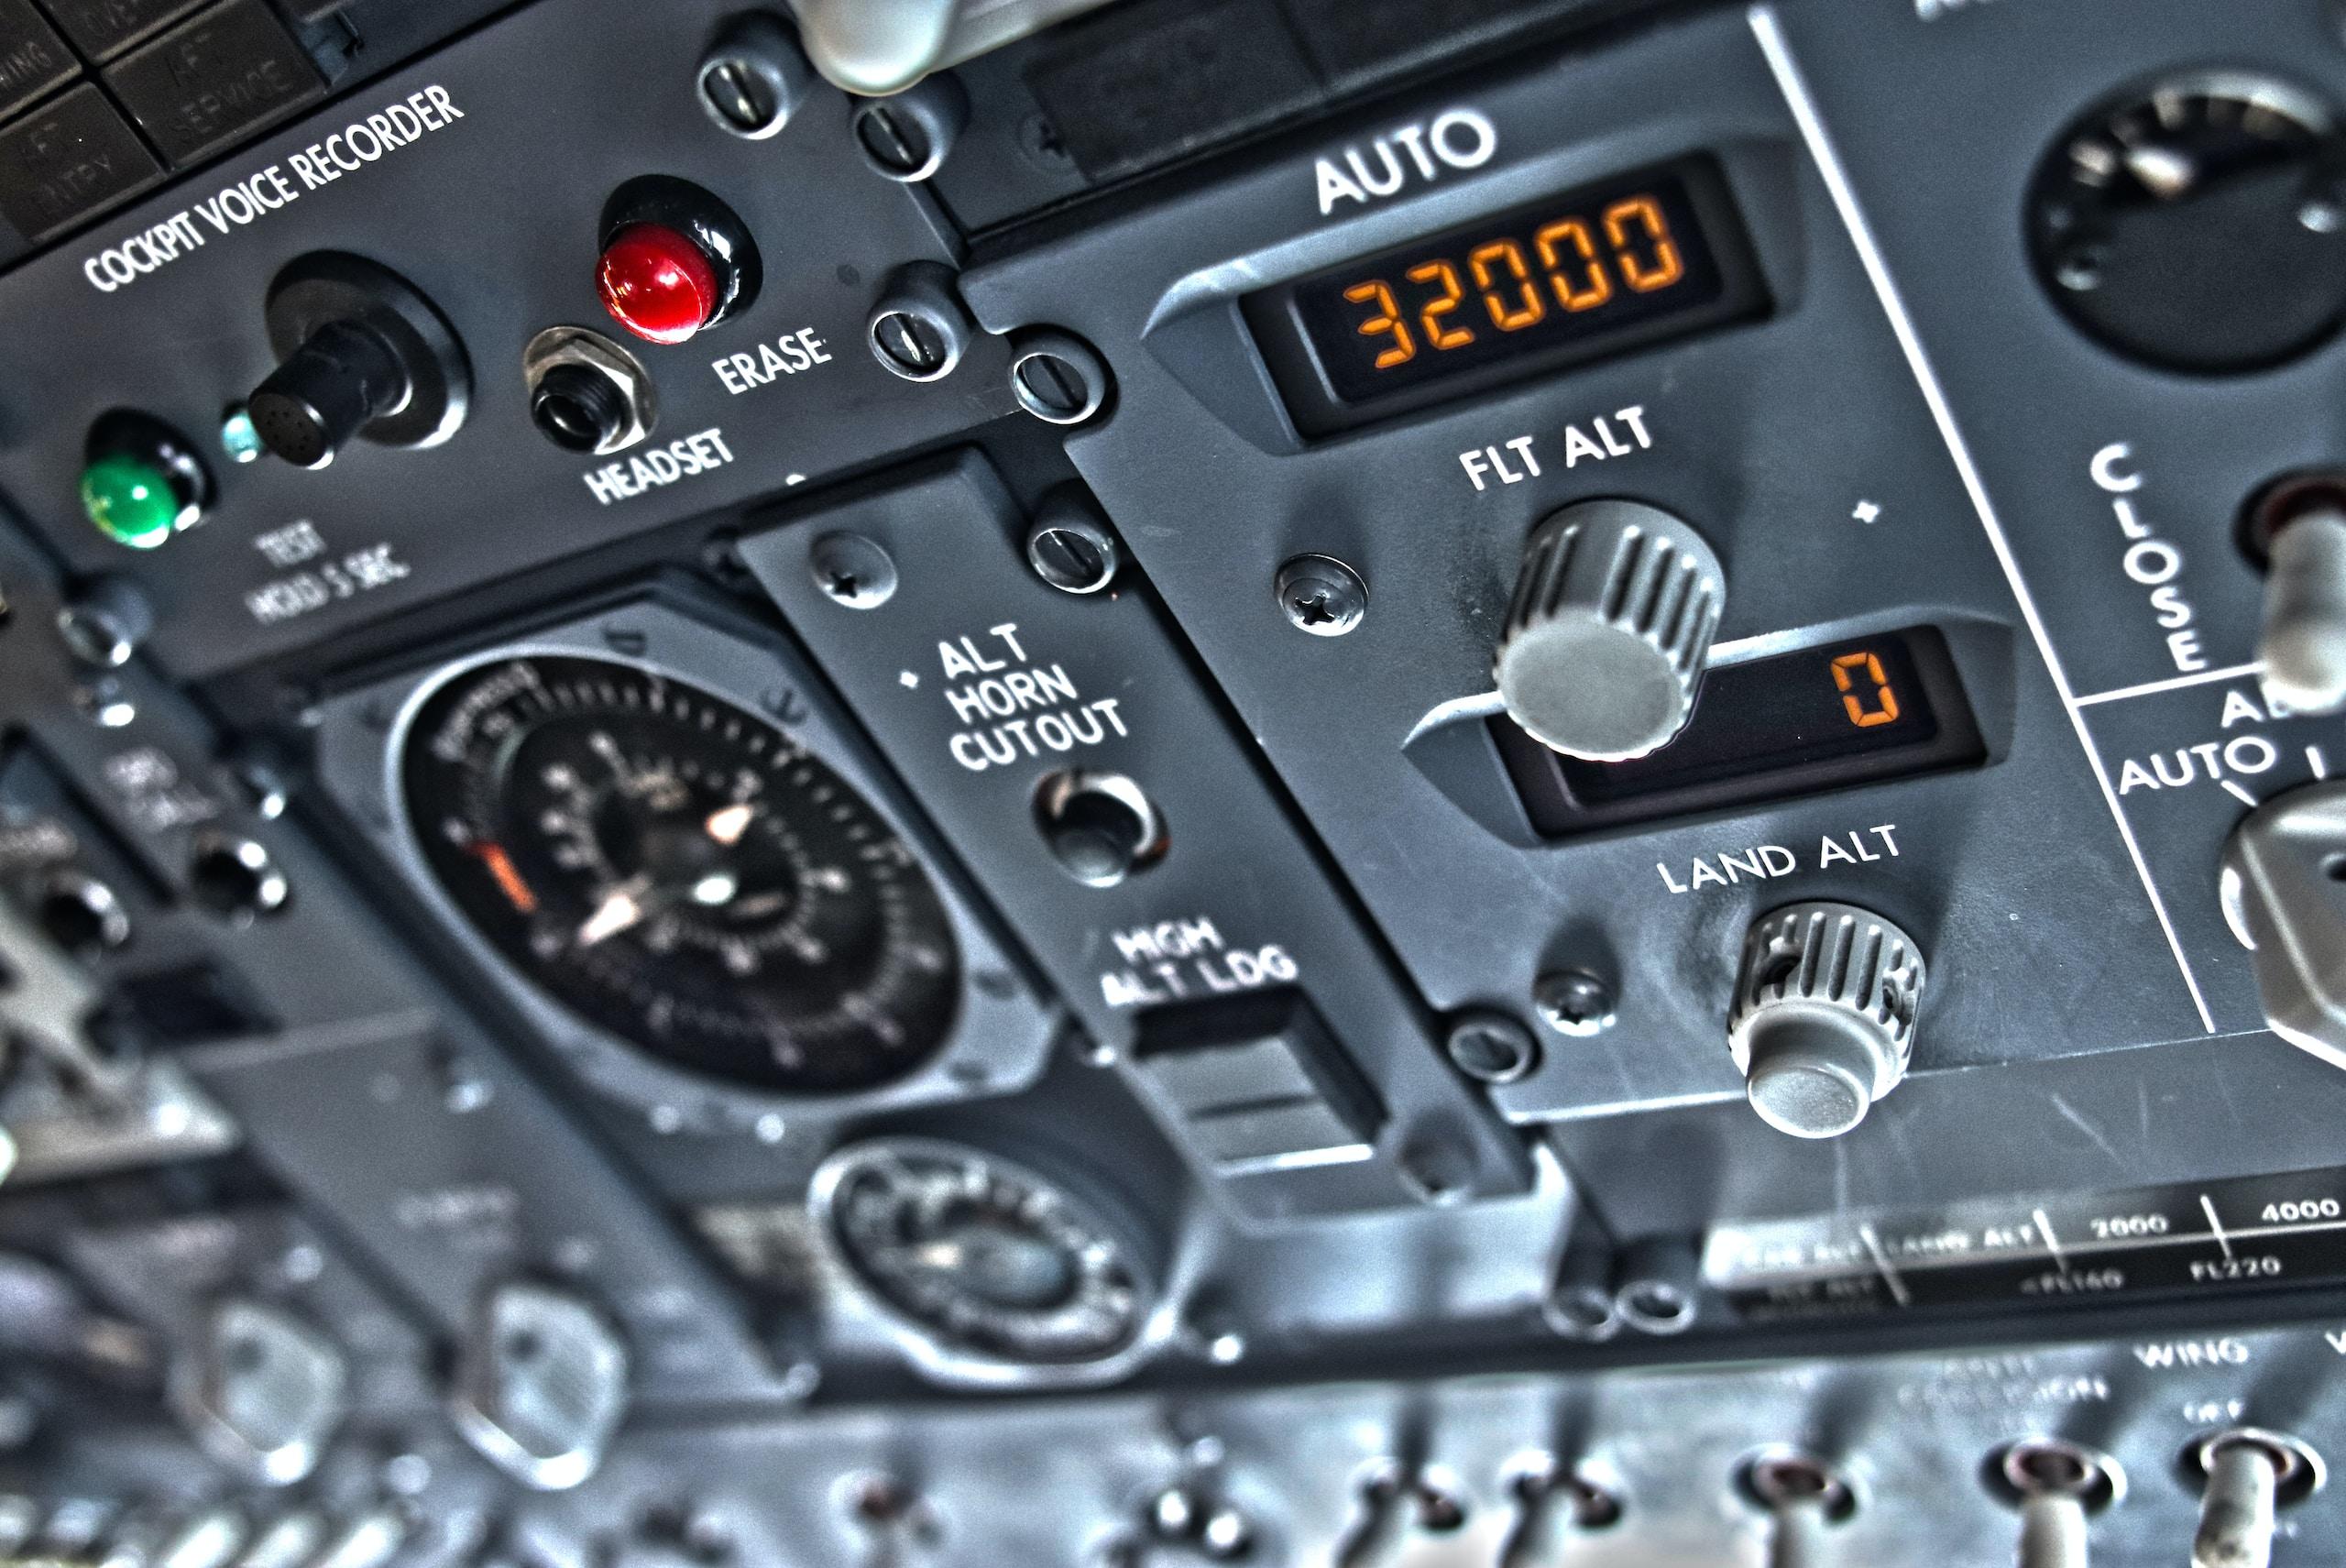 Boeing 737 Overhead paneal